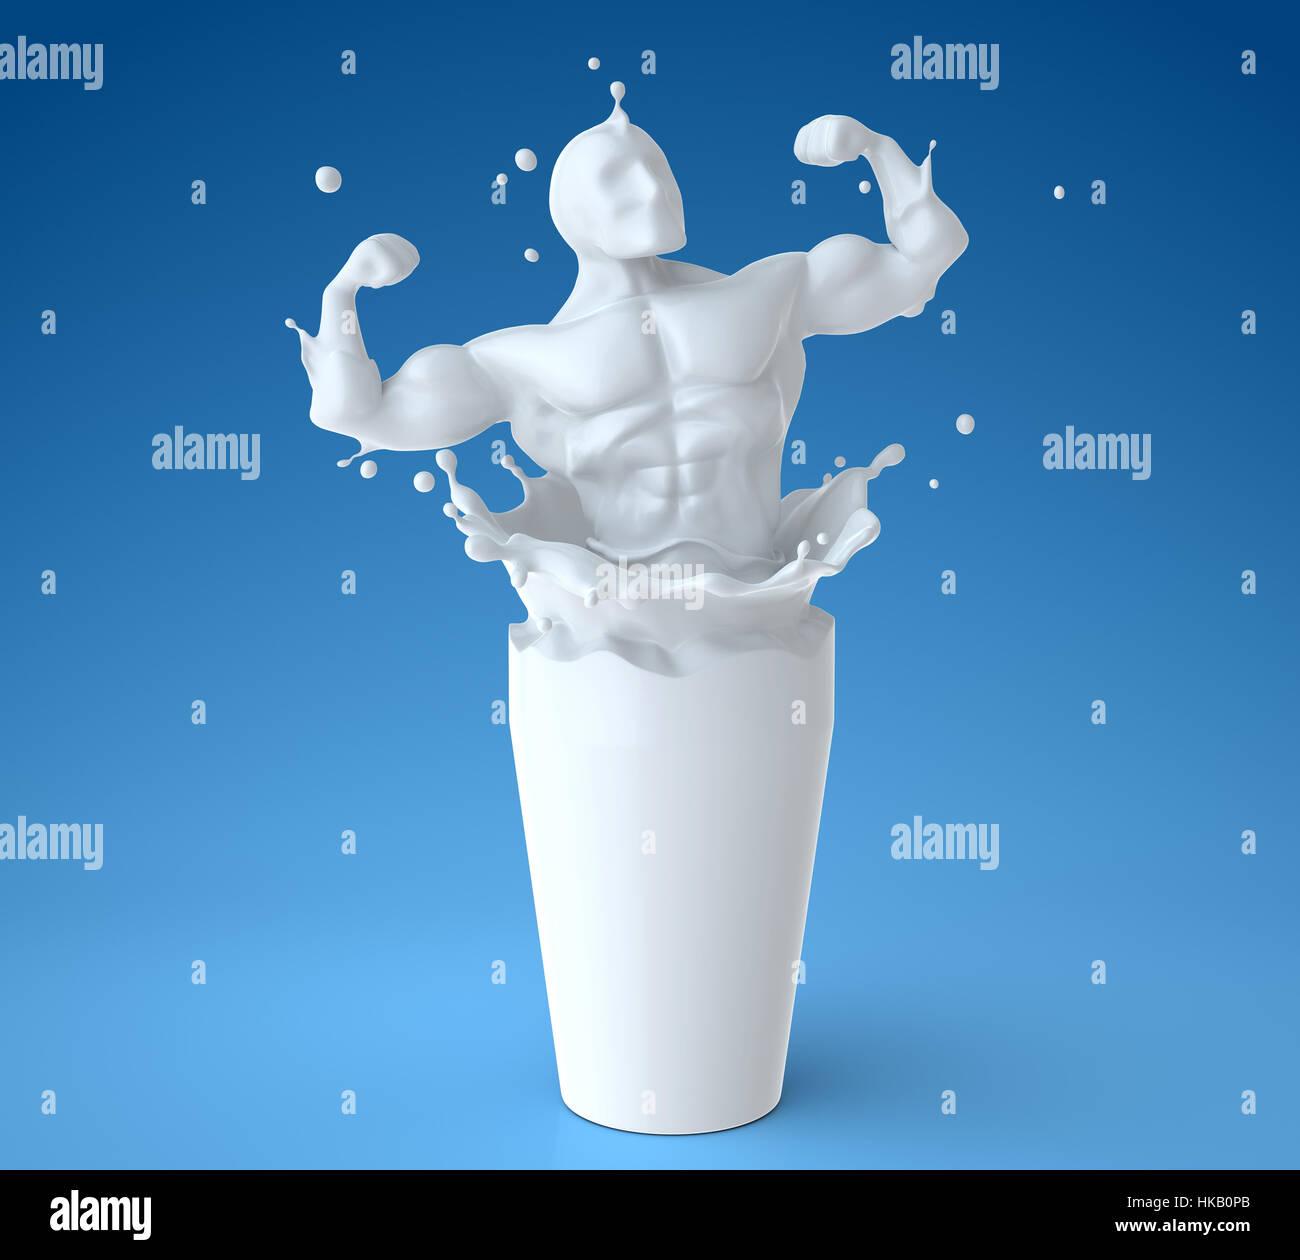 Splash of milk in form of athlete body. 3D illustration - Stock Image